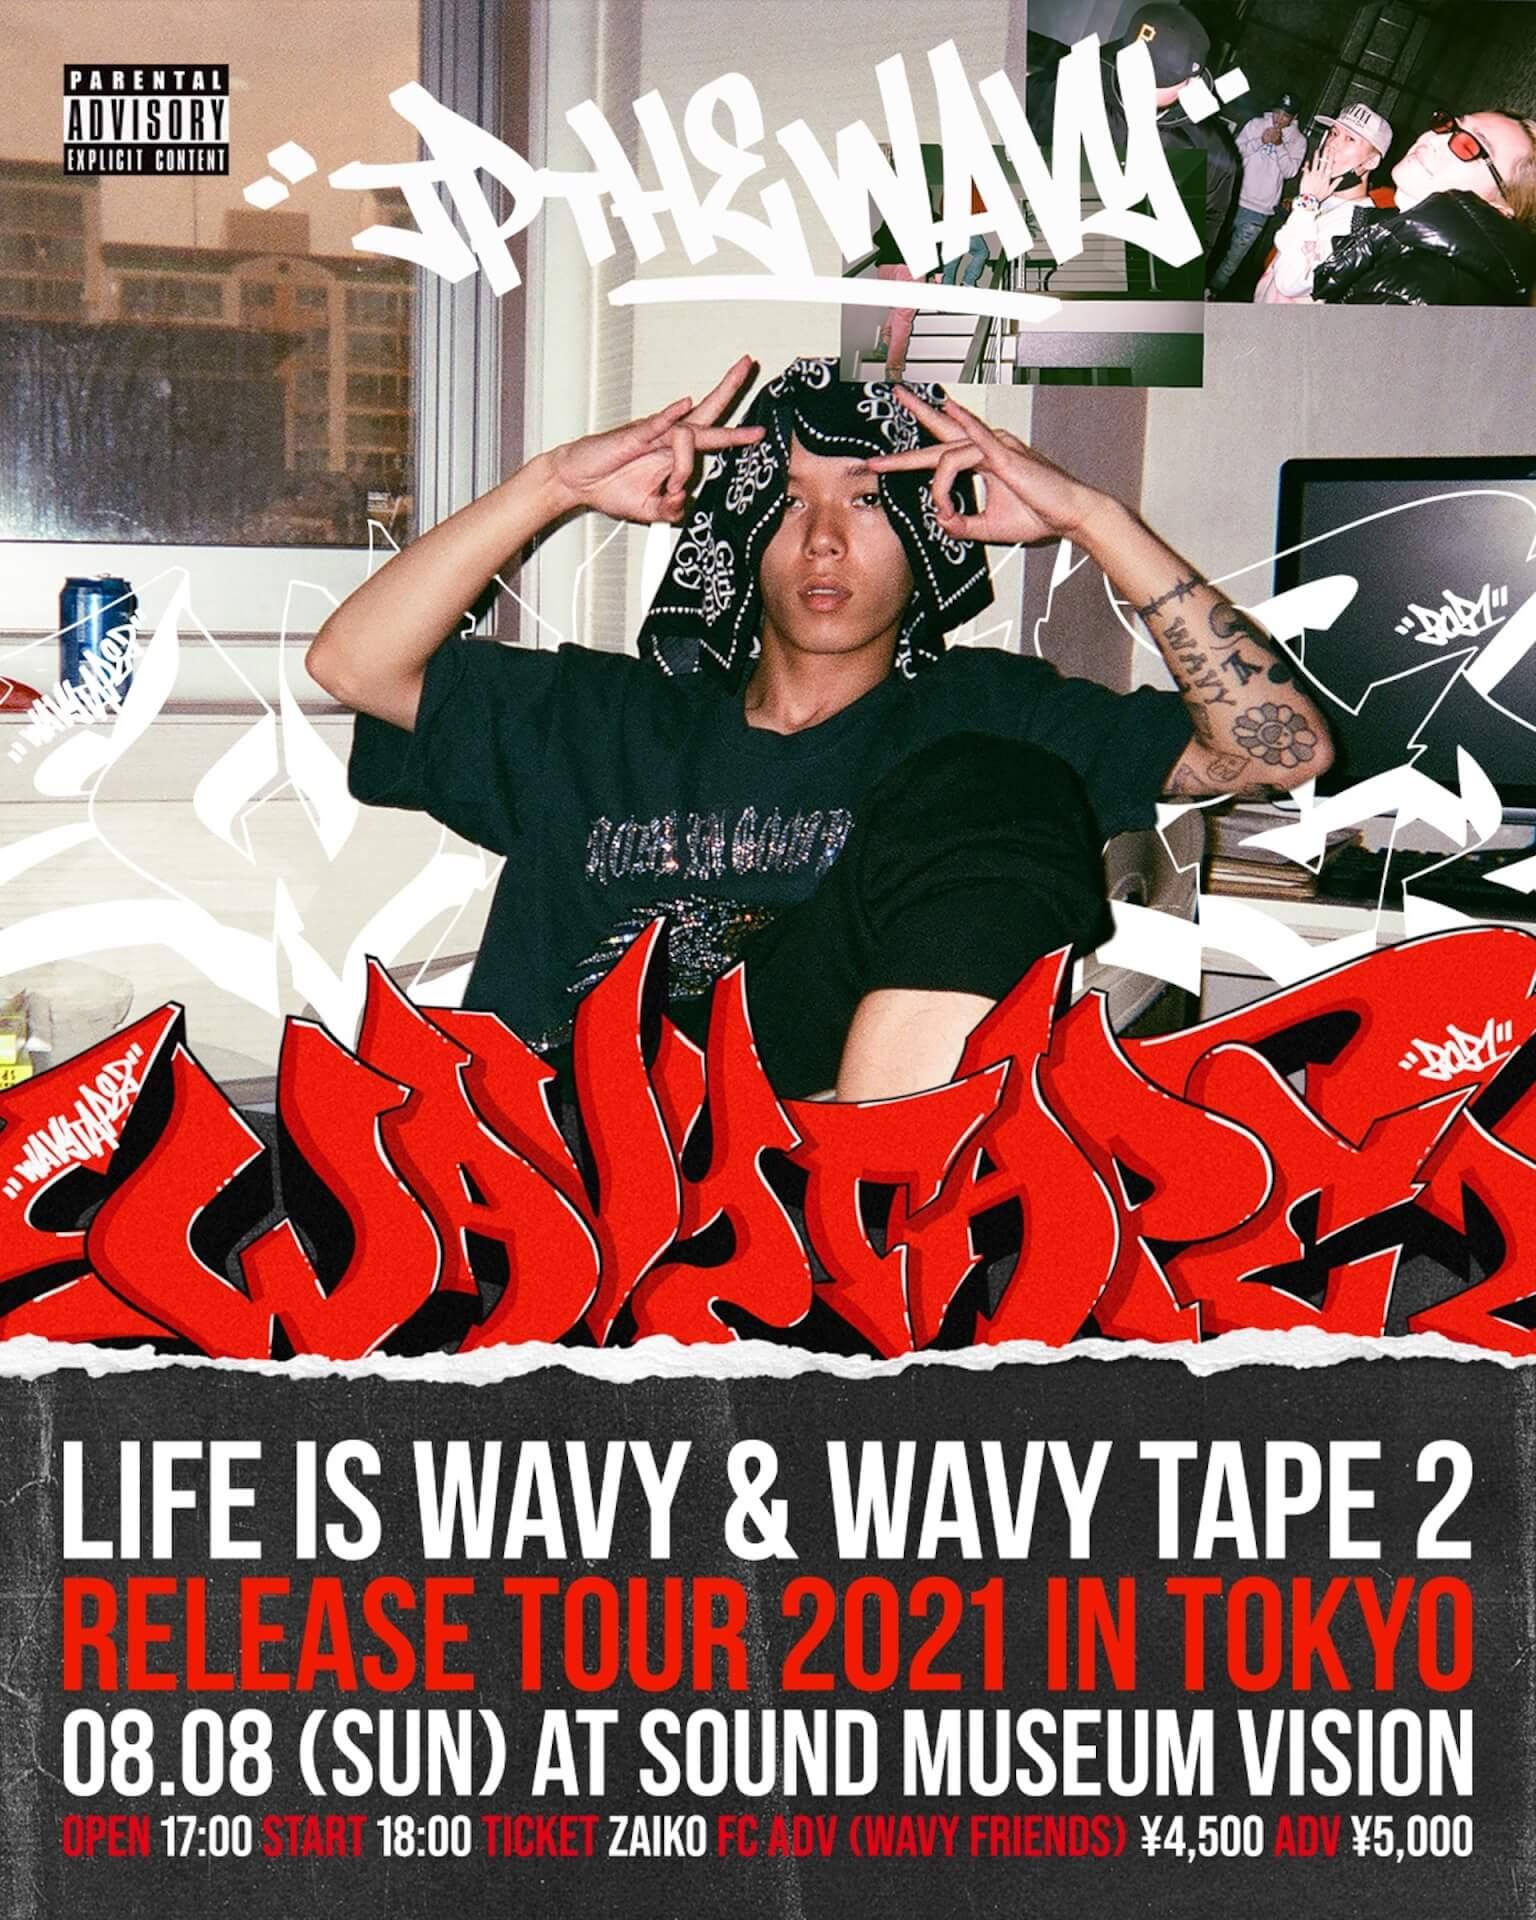 JP THE WAVYのクラブツアー東京公演がVISIONで開催決定!初のオンラインライブノーカット映像がZAIKOで独占配信中 music210621_jpthewavy_live_4